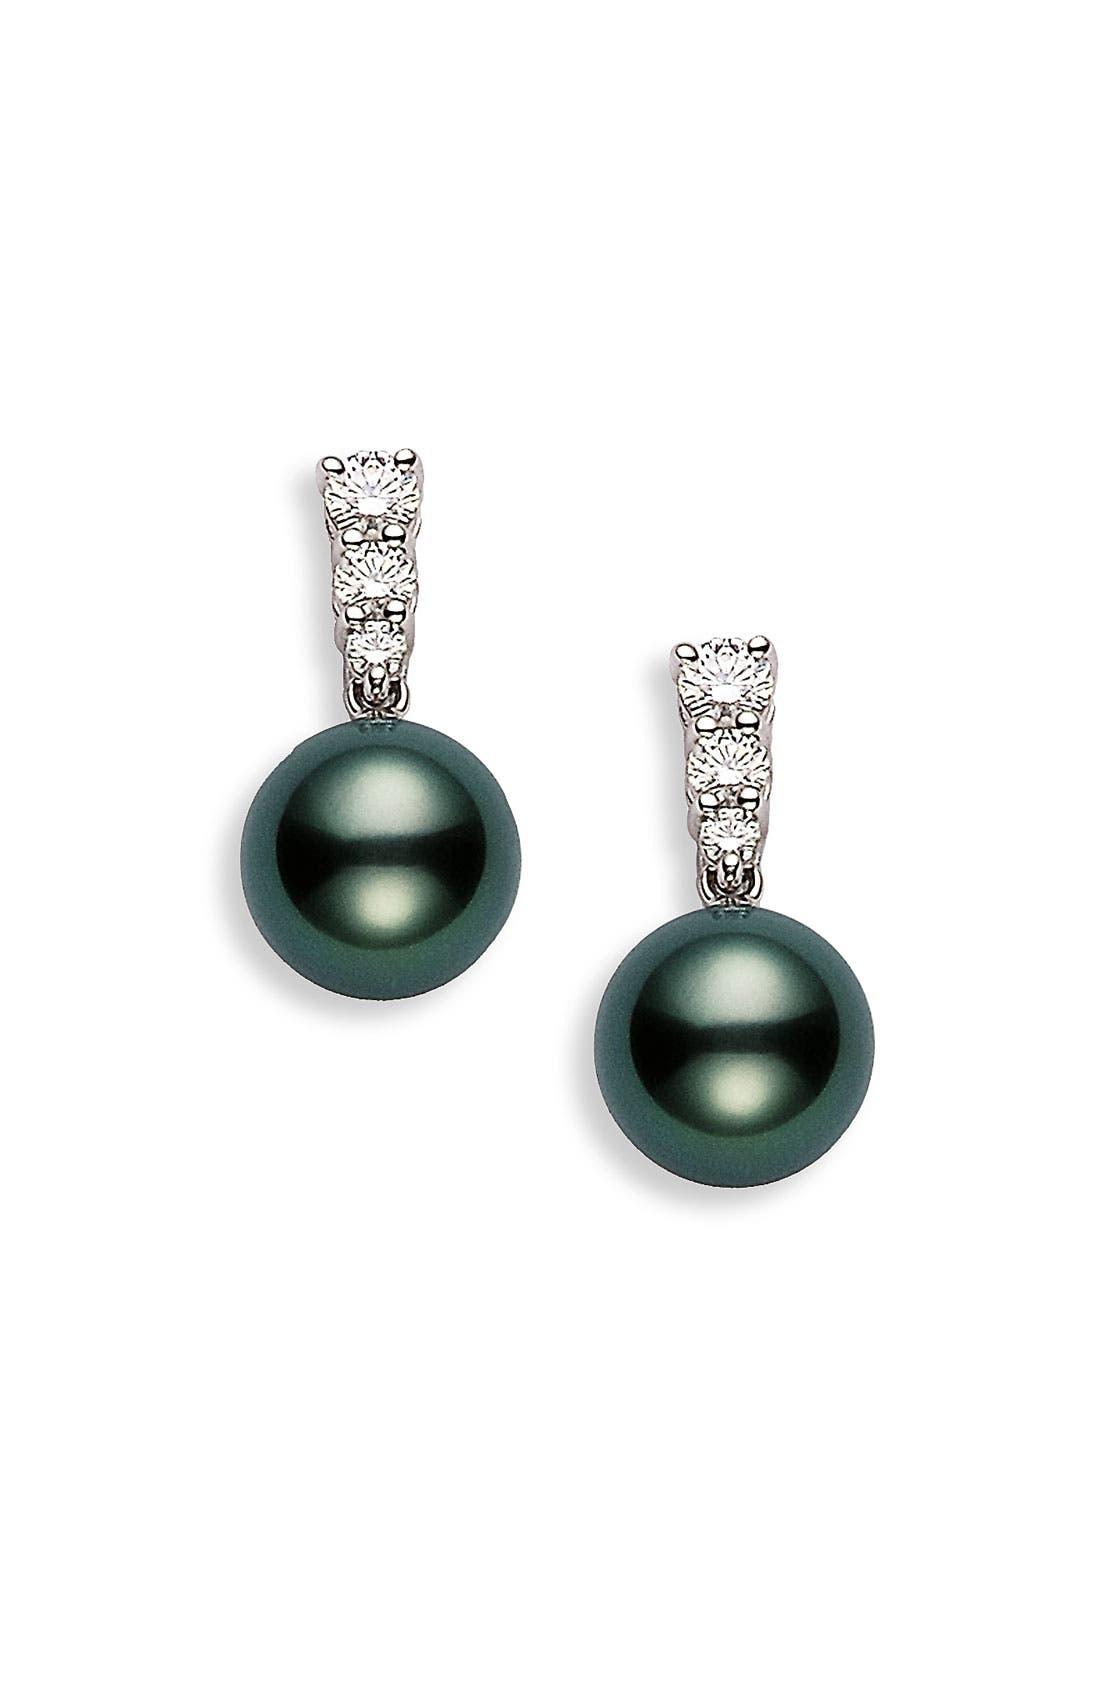 'Morning Dew' Black South Sea Cultured Pearl & Diamond Earrings